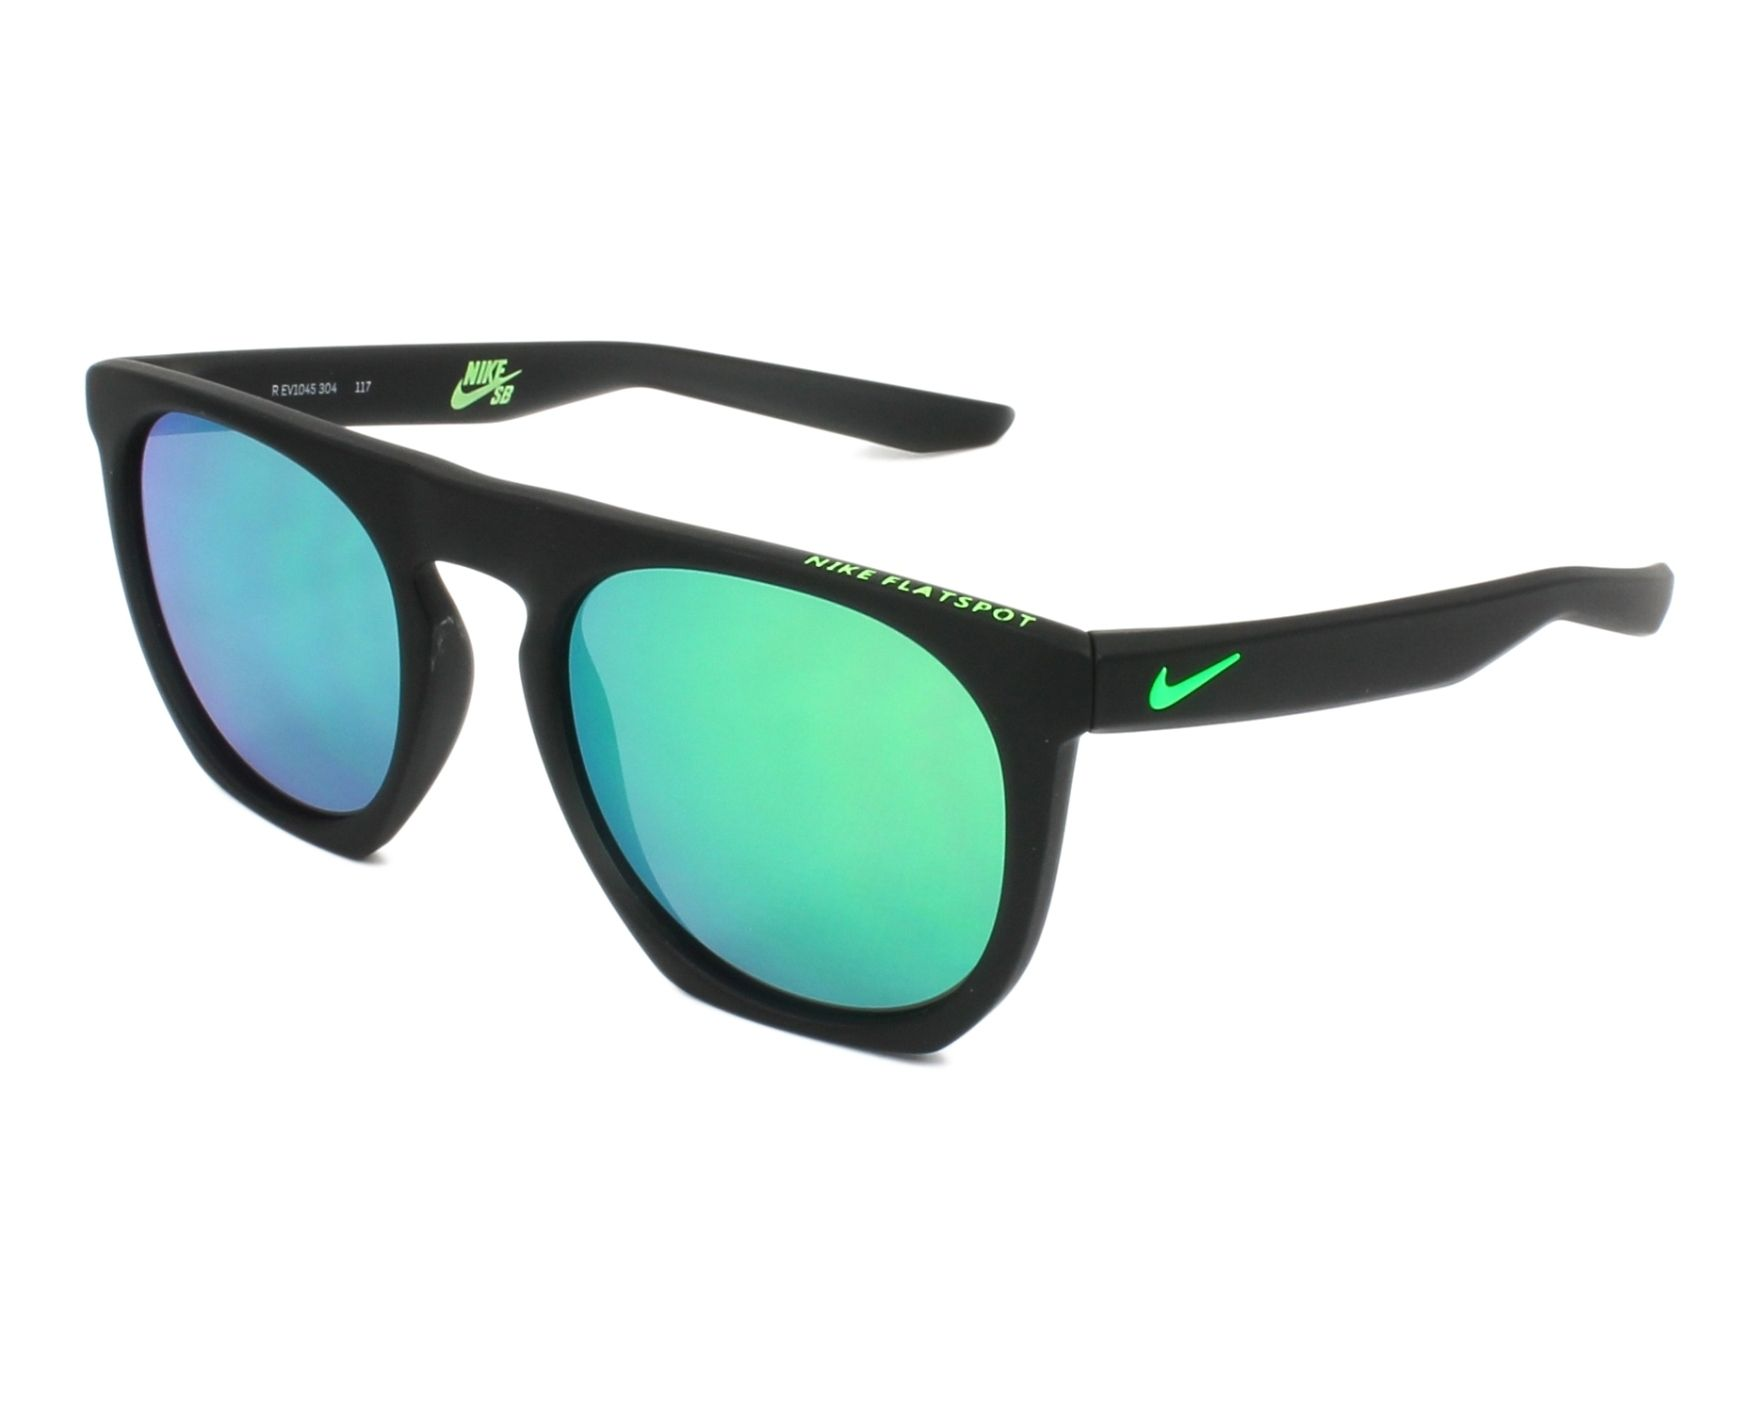 10066c033a Gafas de sol Nike EV-1045 304 - Negra Gris vista de perfil